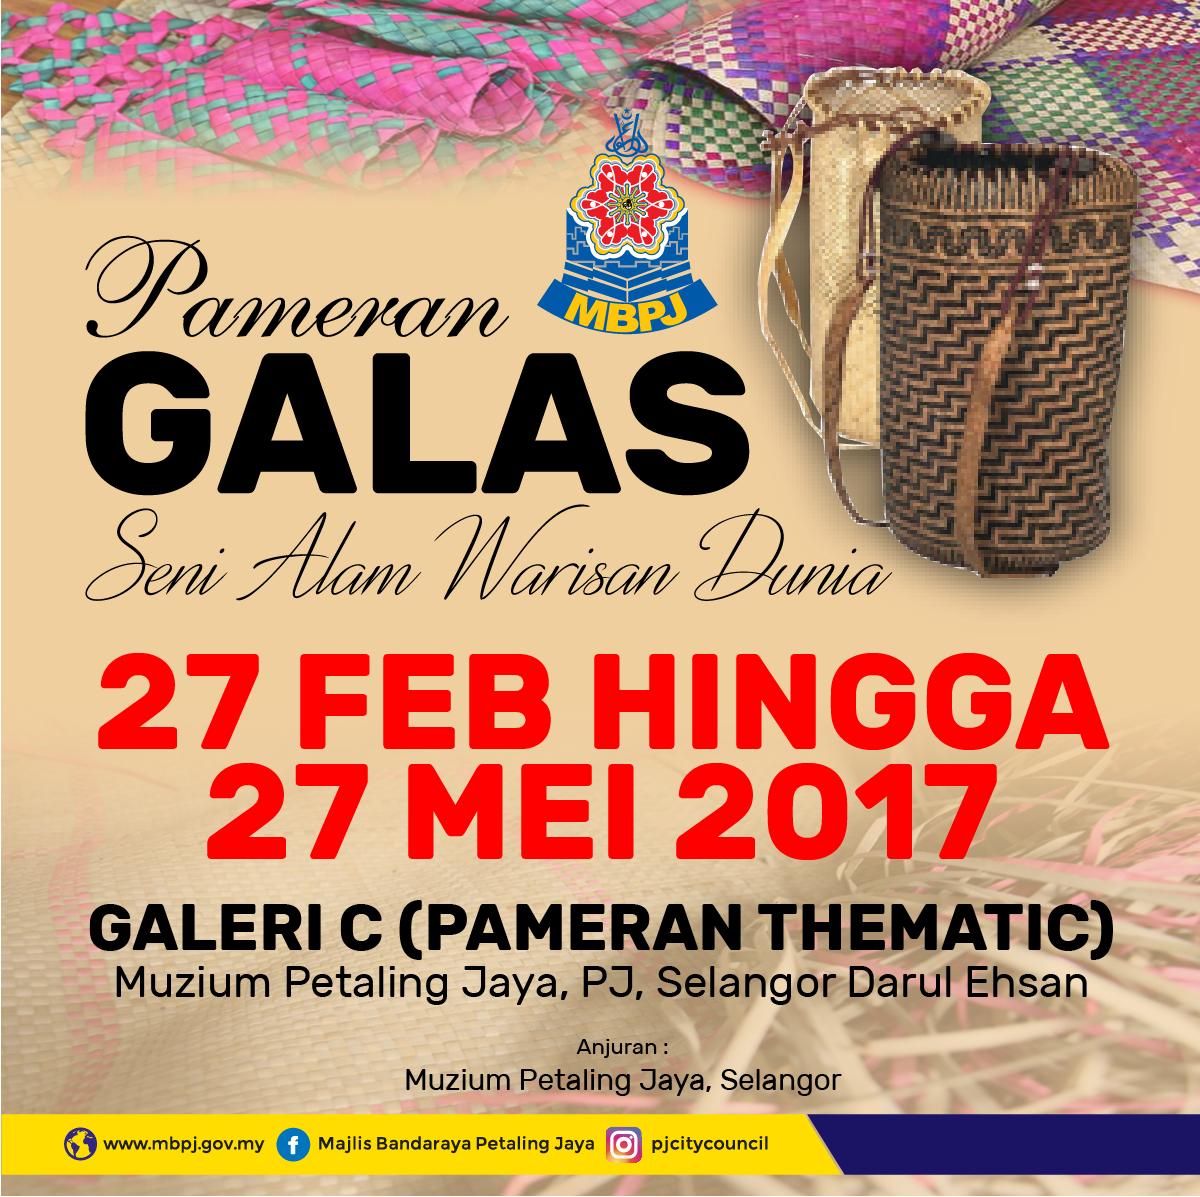 Pameran Galas Info